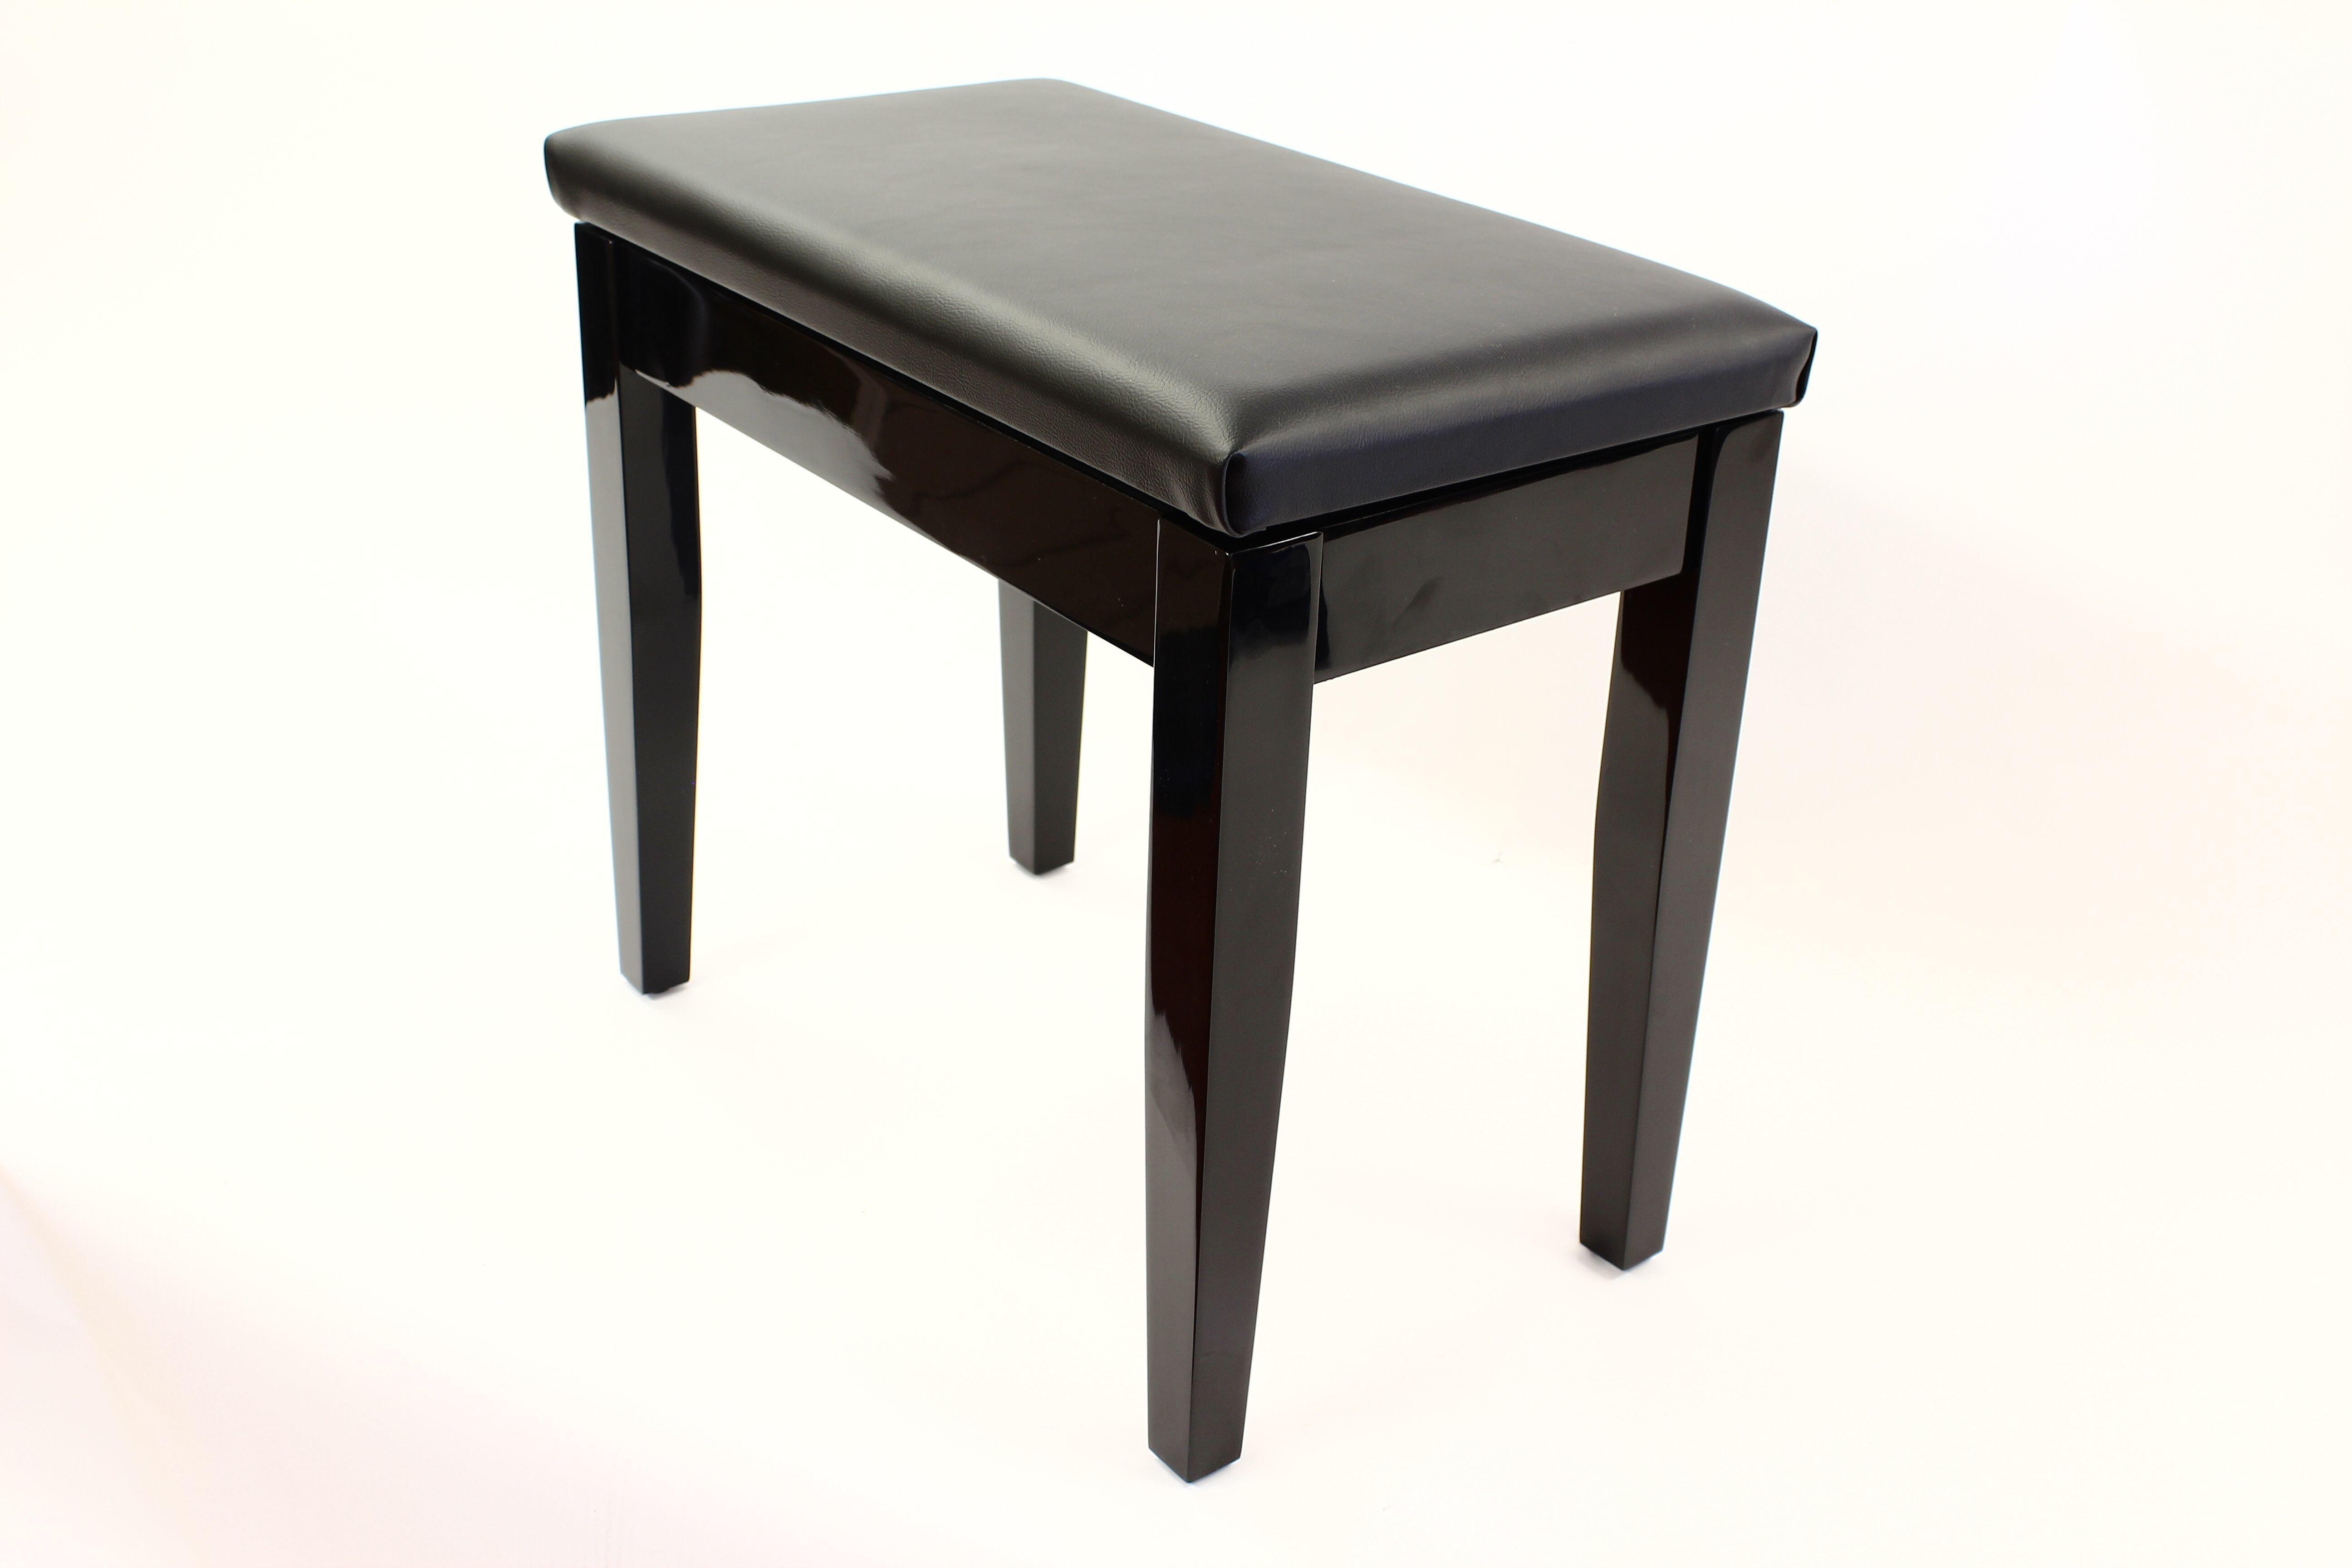 Coda Piano Stool Black with Storage 00066